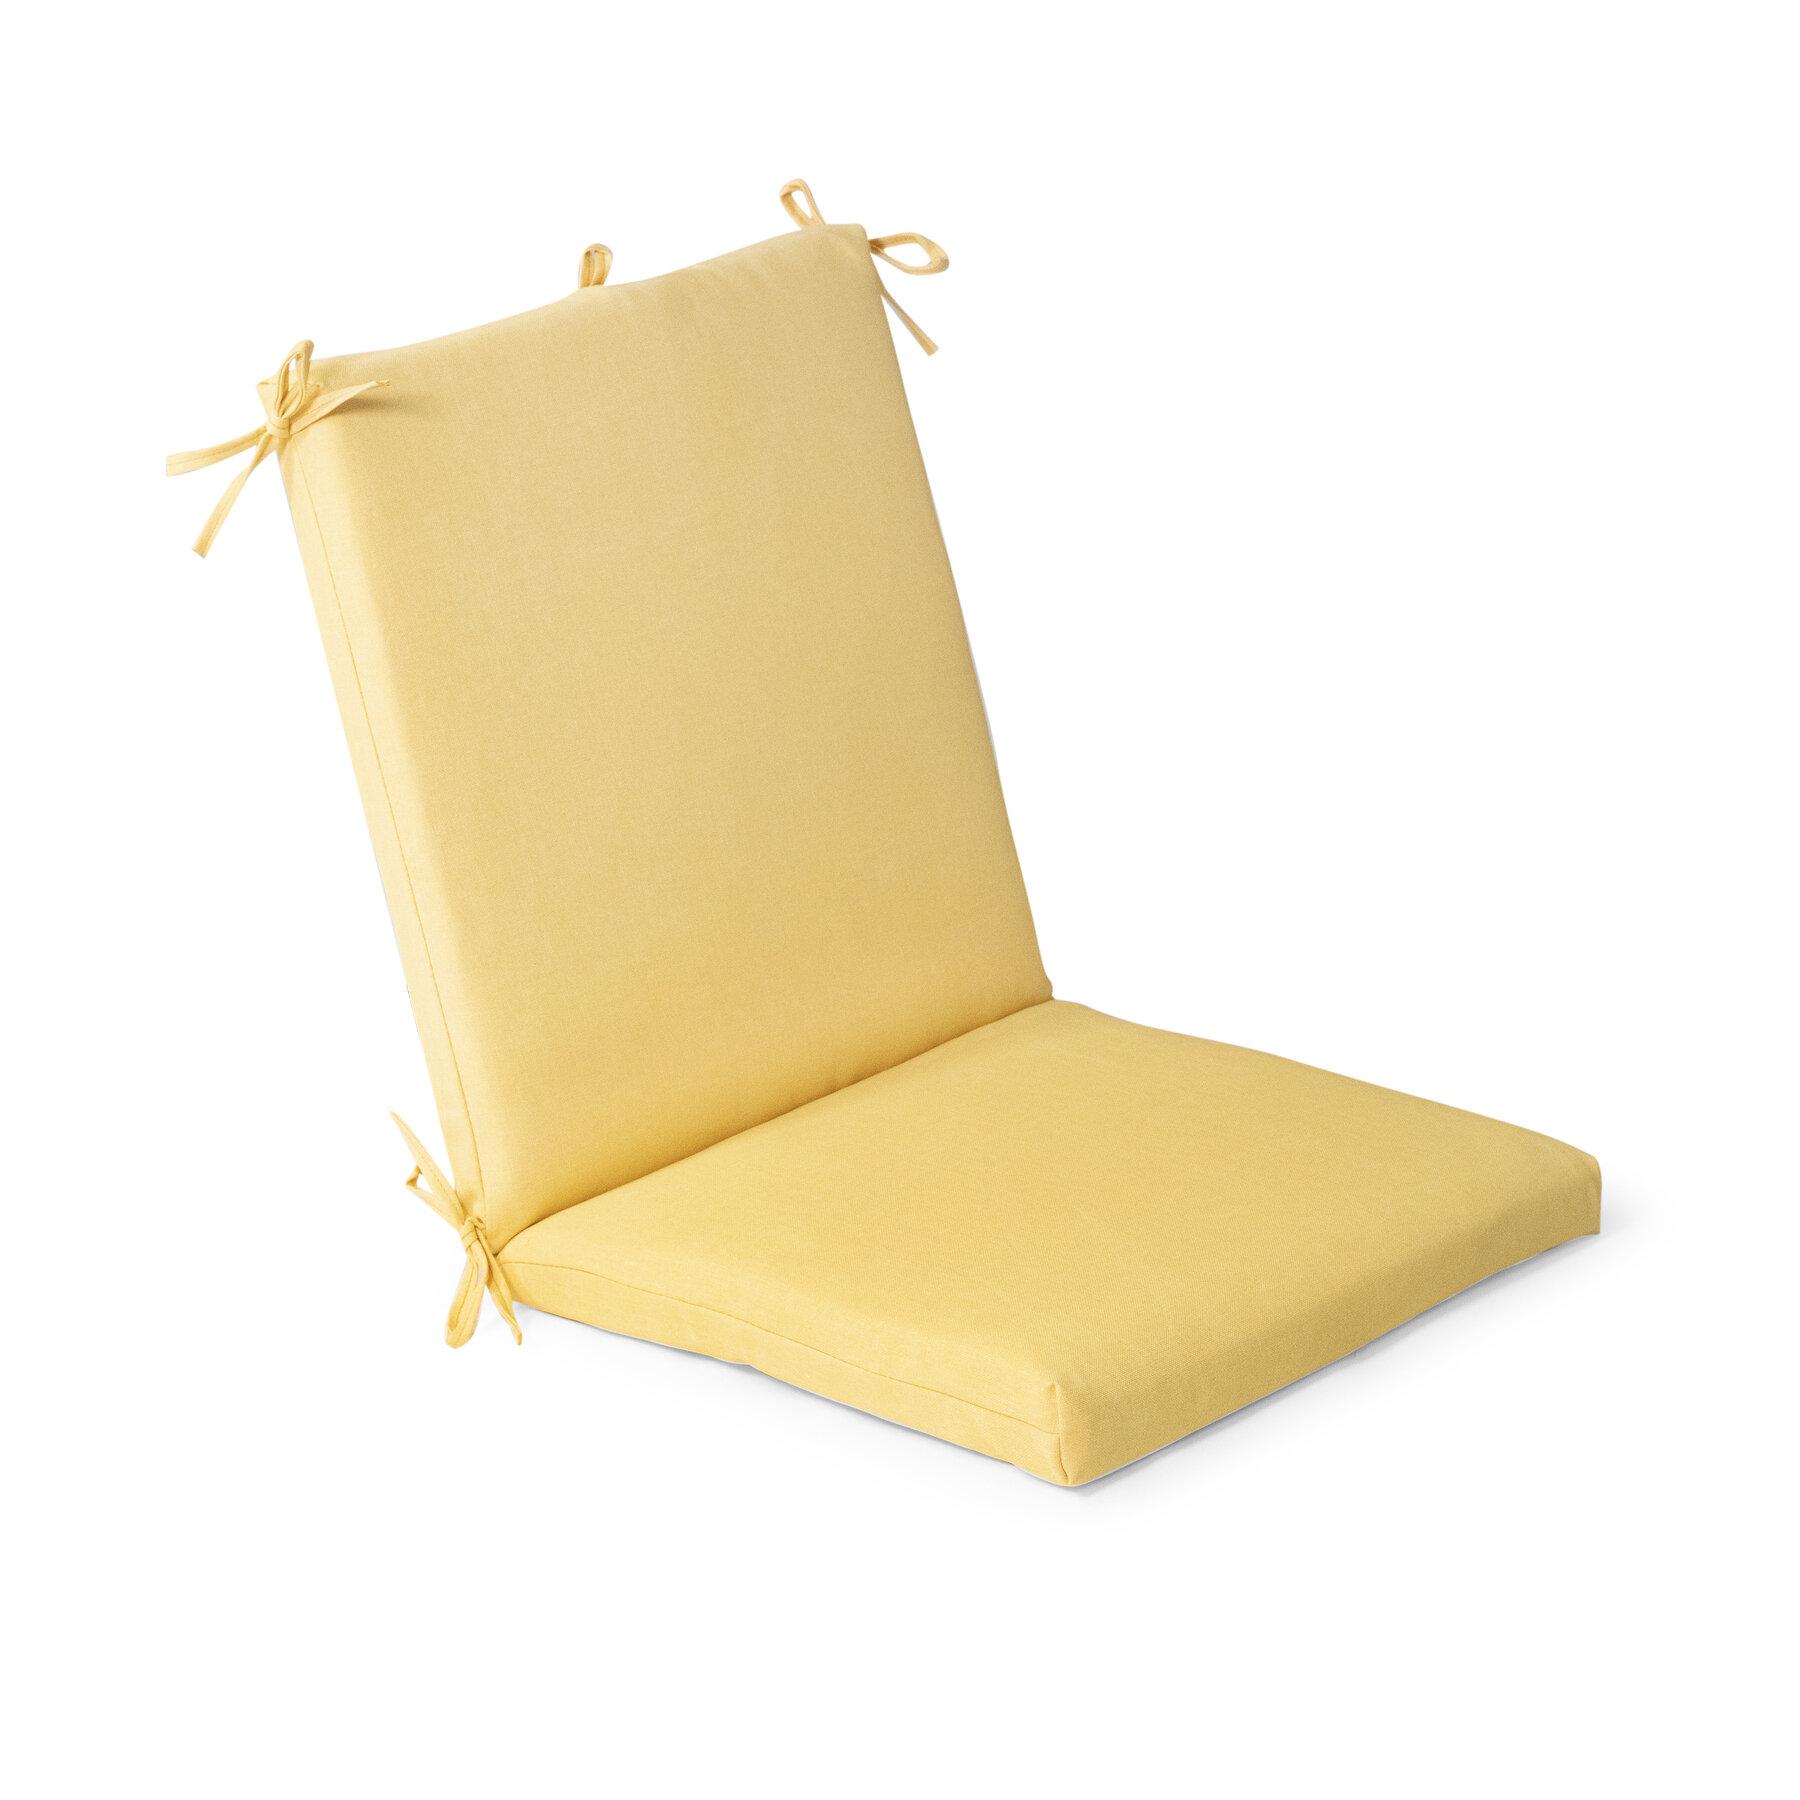 Yellow Chair Seat Cushions You Ll Love In 2021 Wayfair